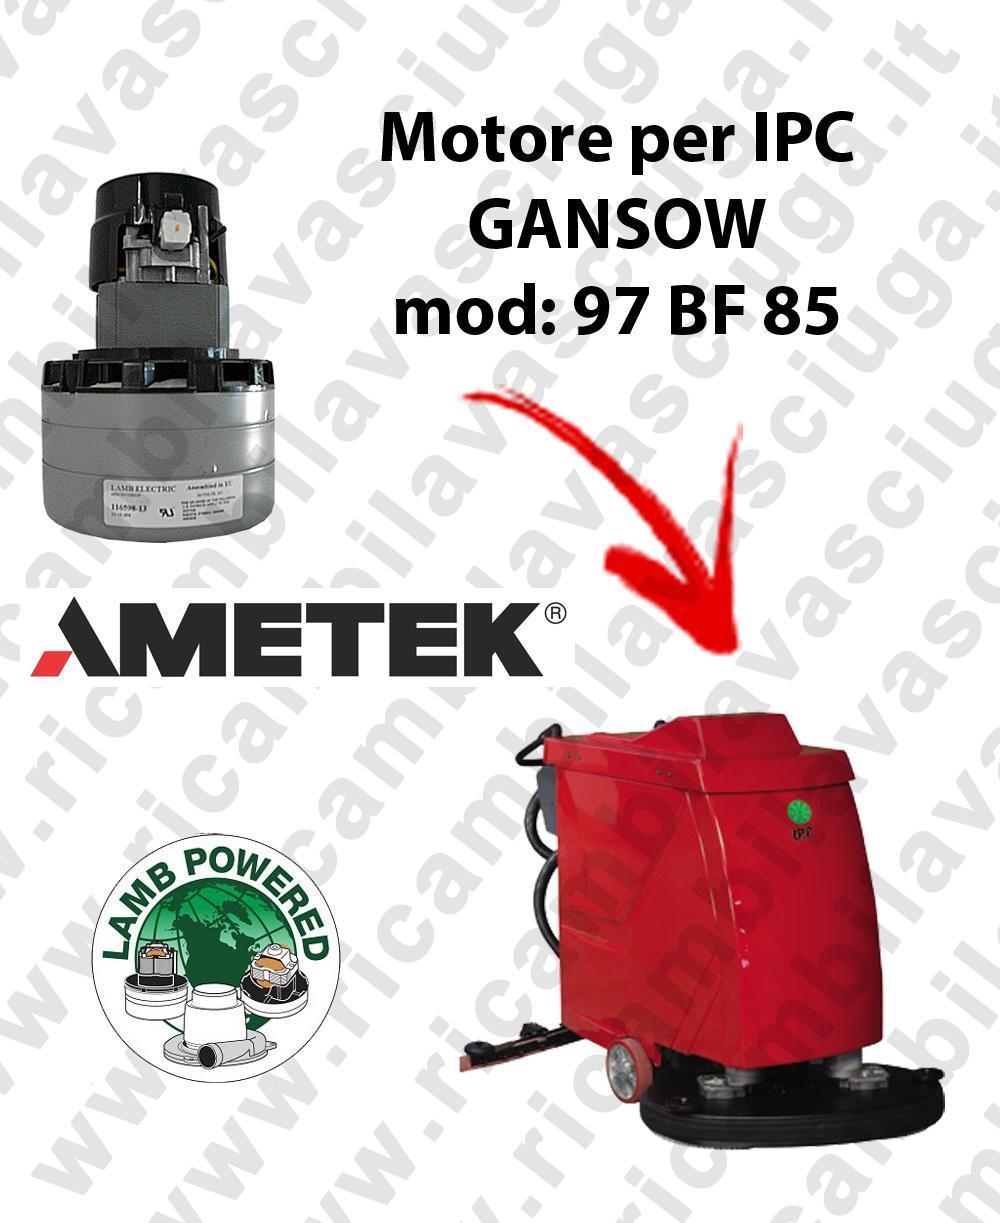 97 BF 85 LAMB AMETEK vacuum motor for scrubber dryer IPC GANSOW